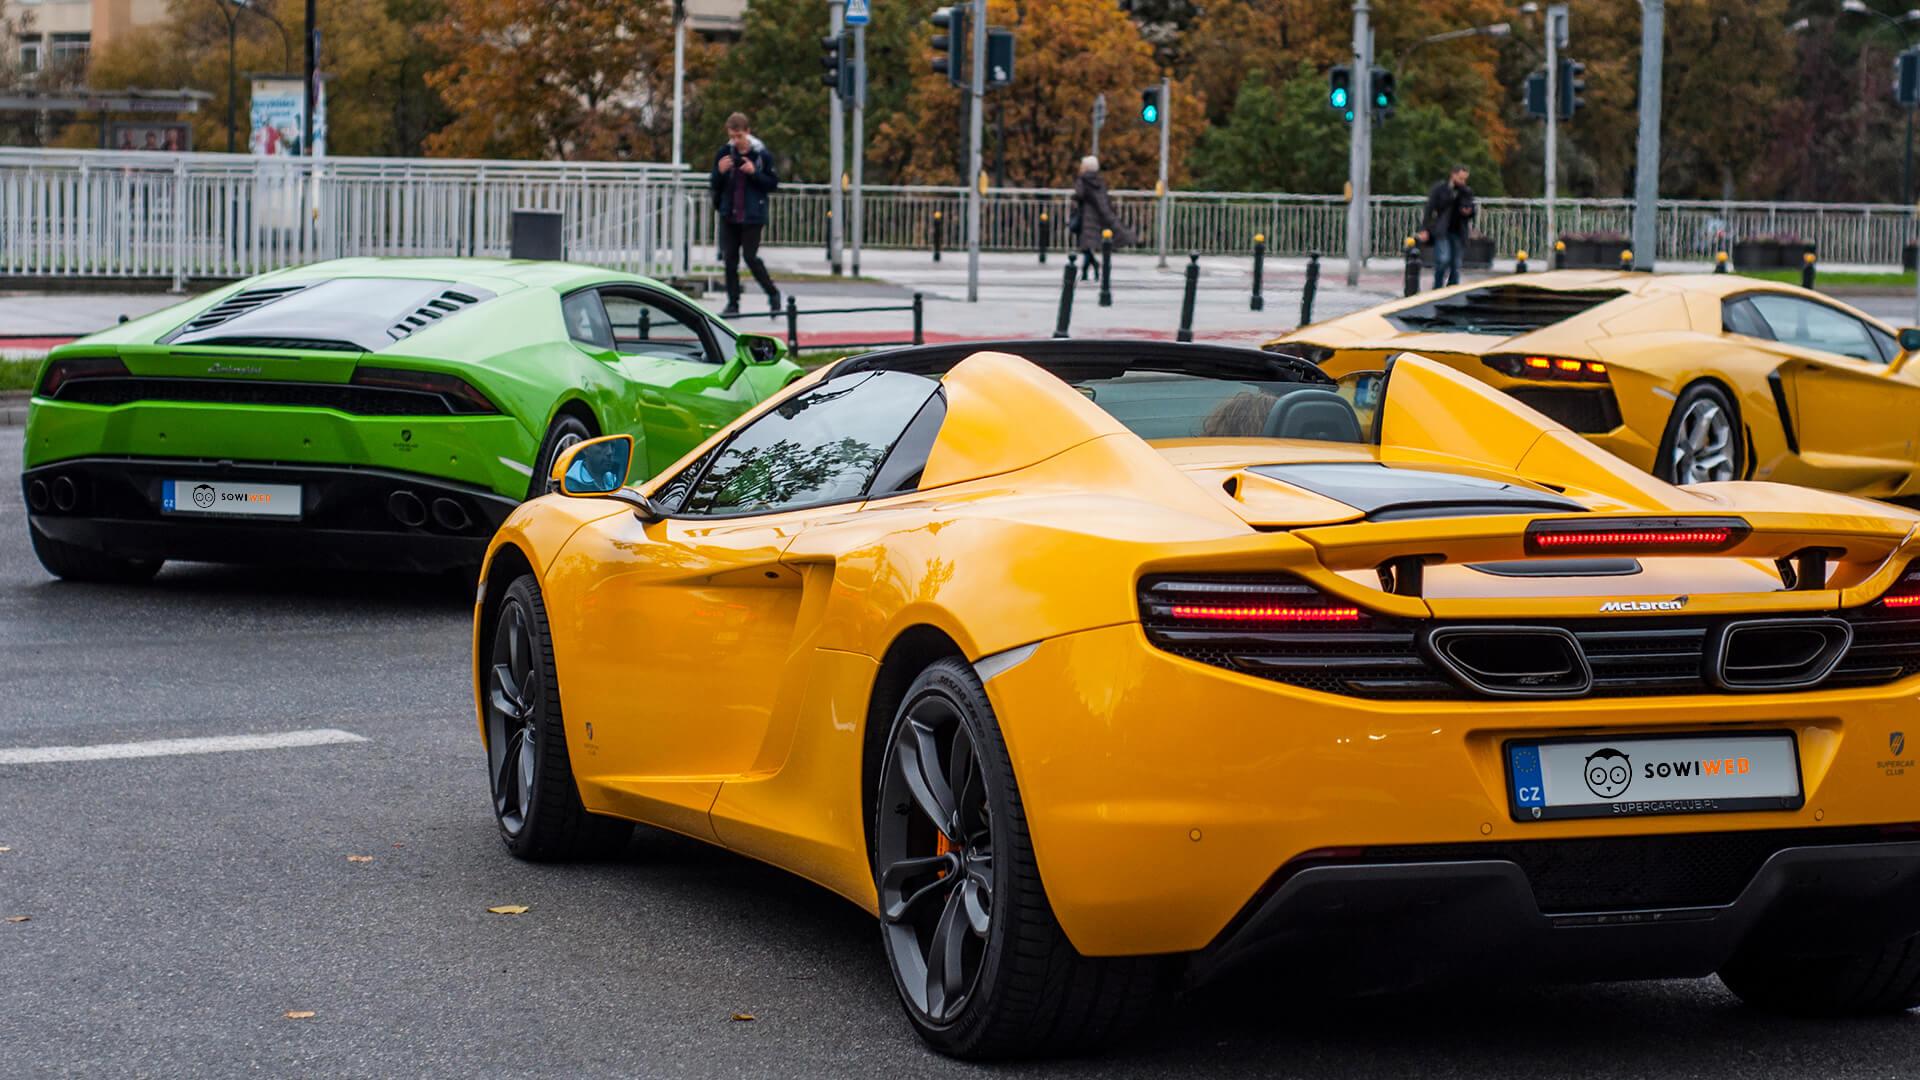 Capital Classic Cars 2017 Warsaw